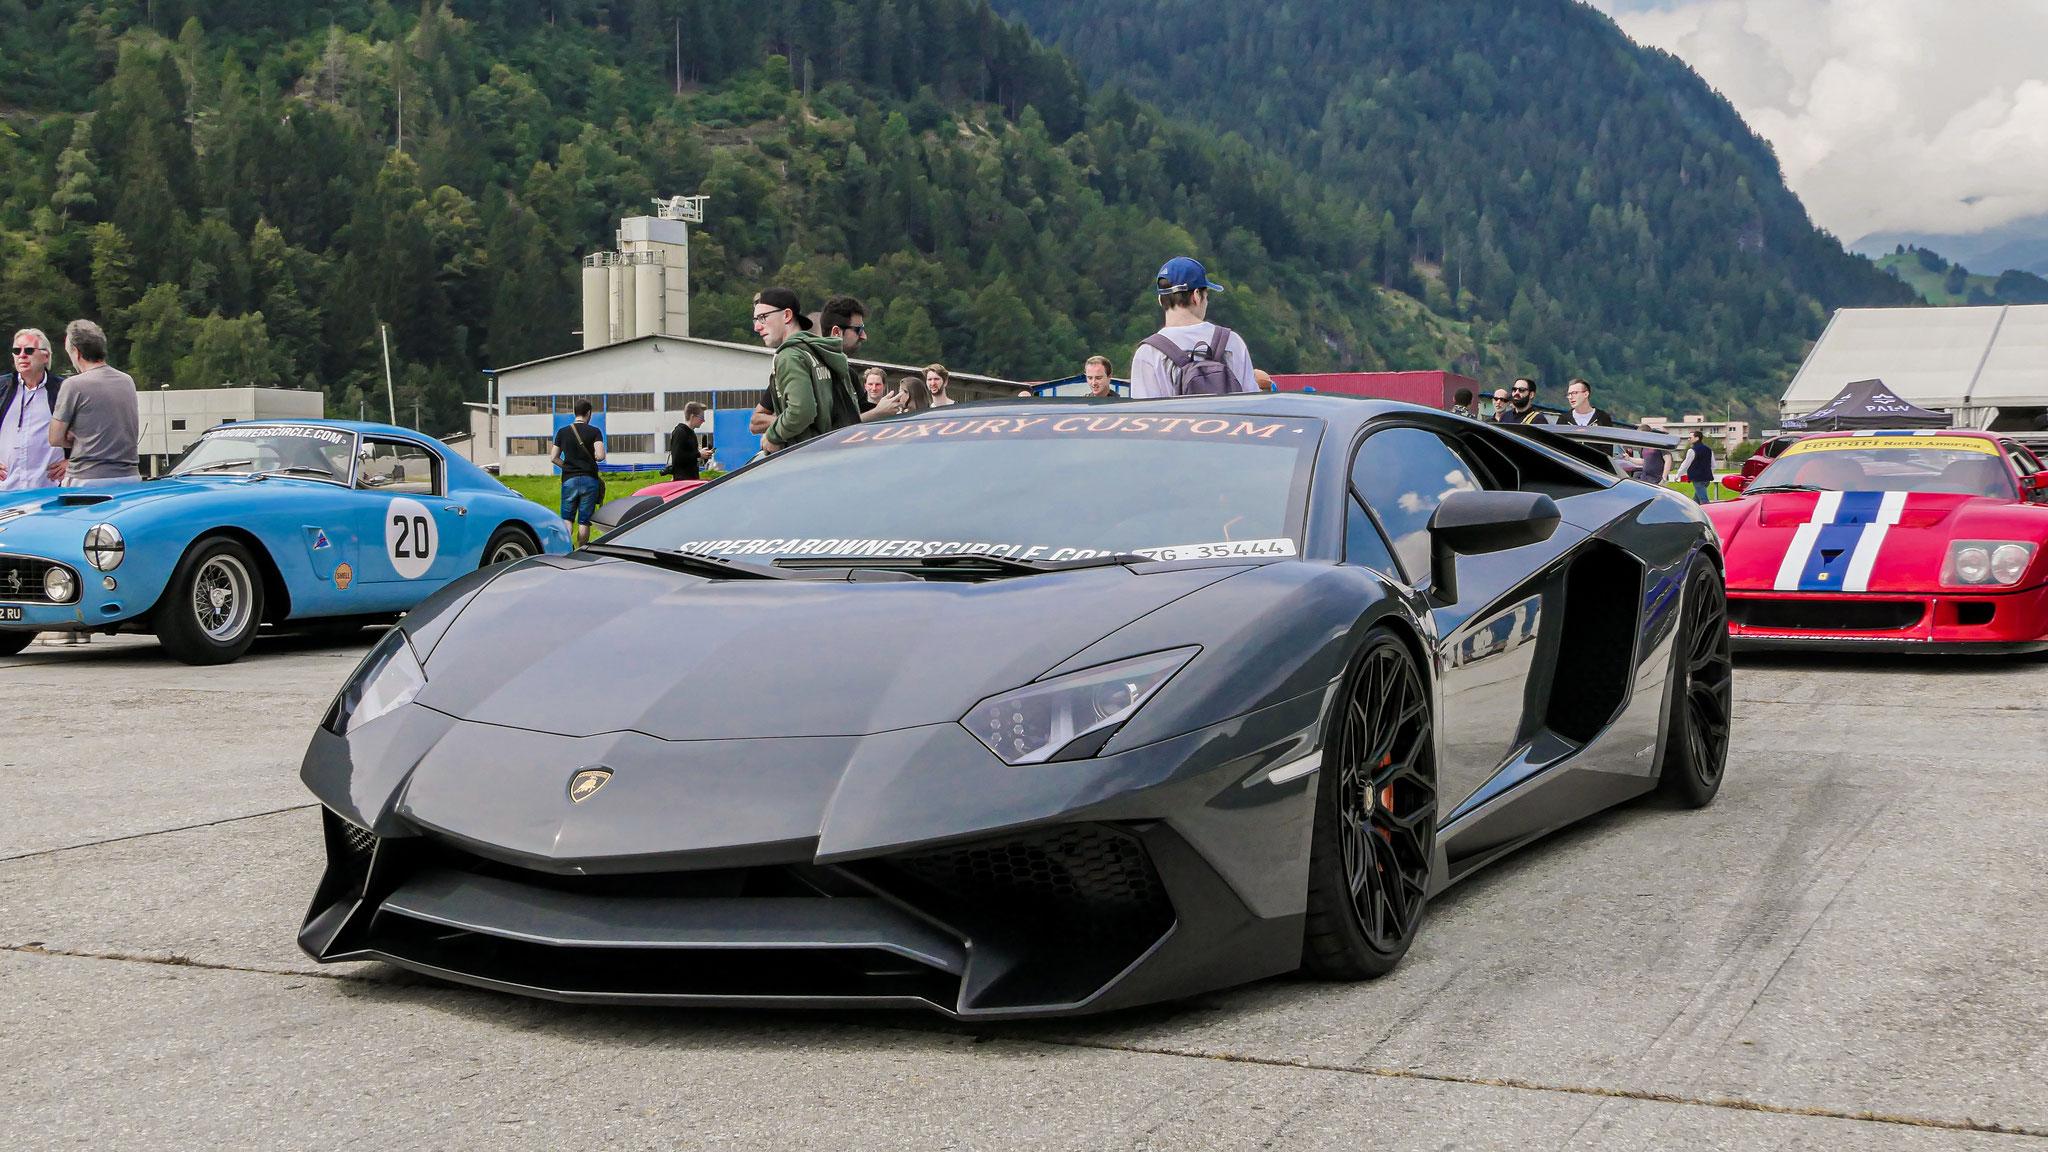 Lamborghini Aventador LP-750-4 SV - ZG-35444 (CH)